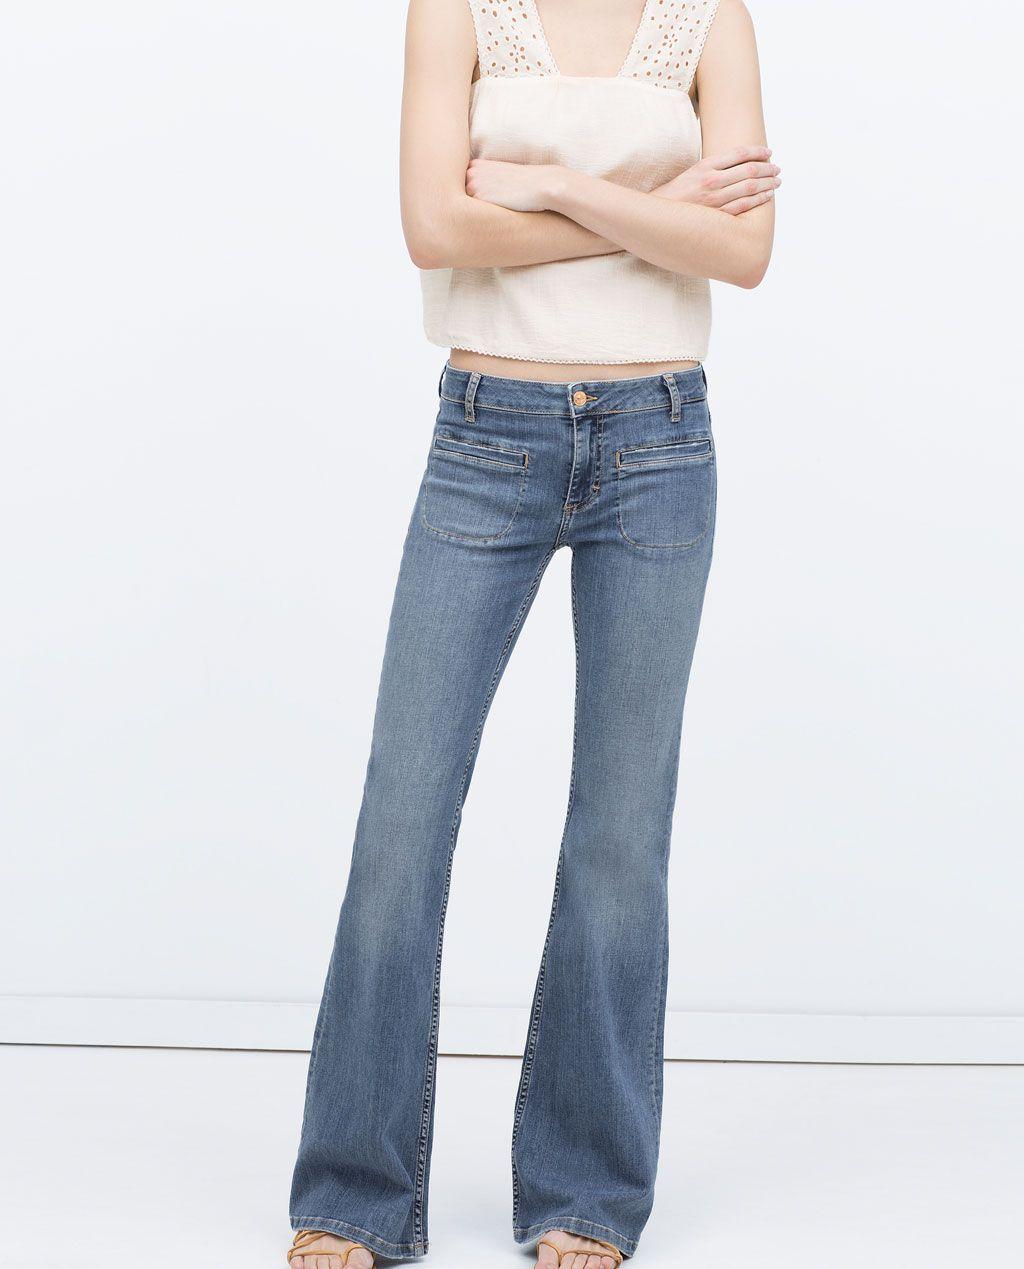 pantalon en denim bootcut femme nouveaut s zara liban. Black Bedroom Furniture Sets. Home Design Ideas